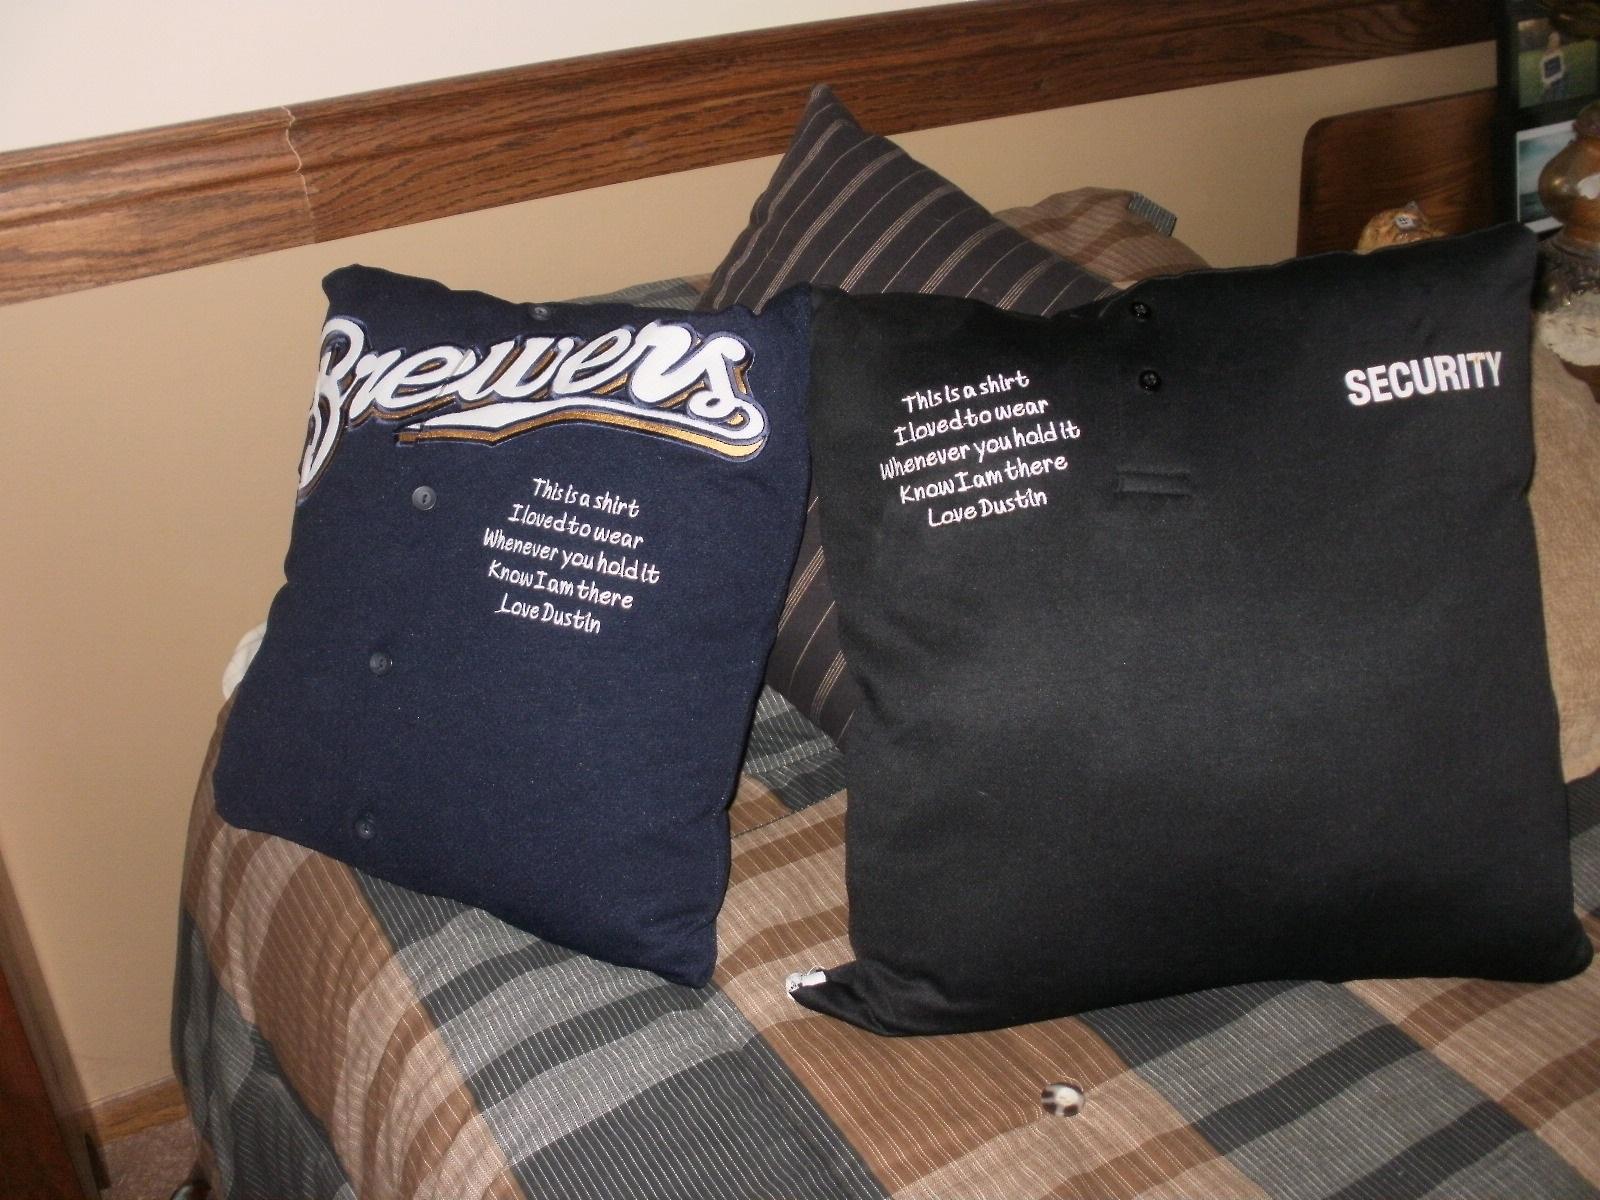 Dustin t-shirt pillows